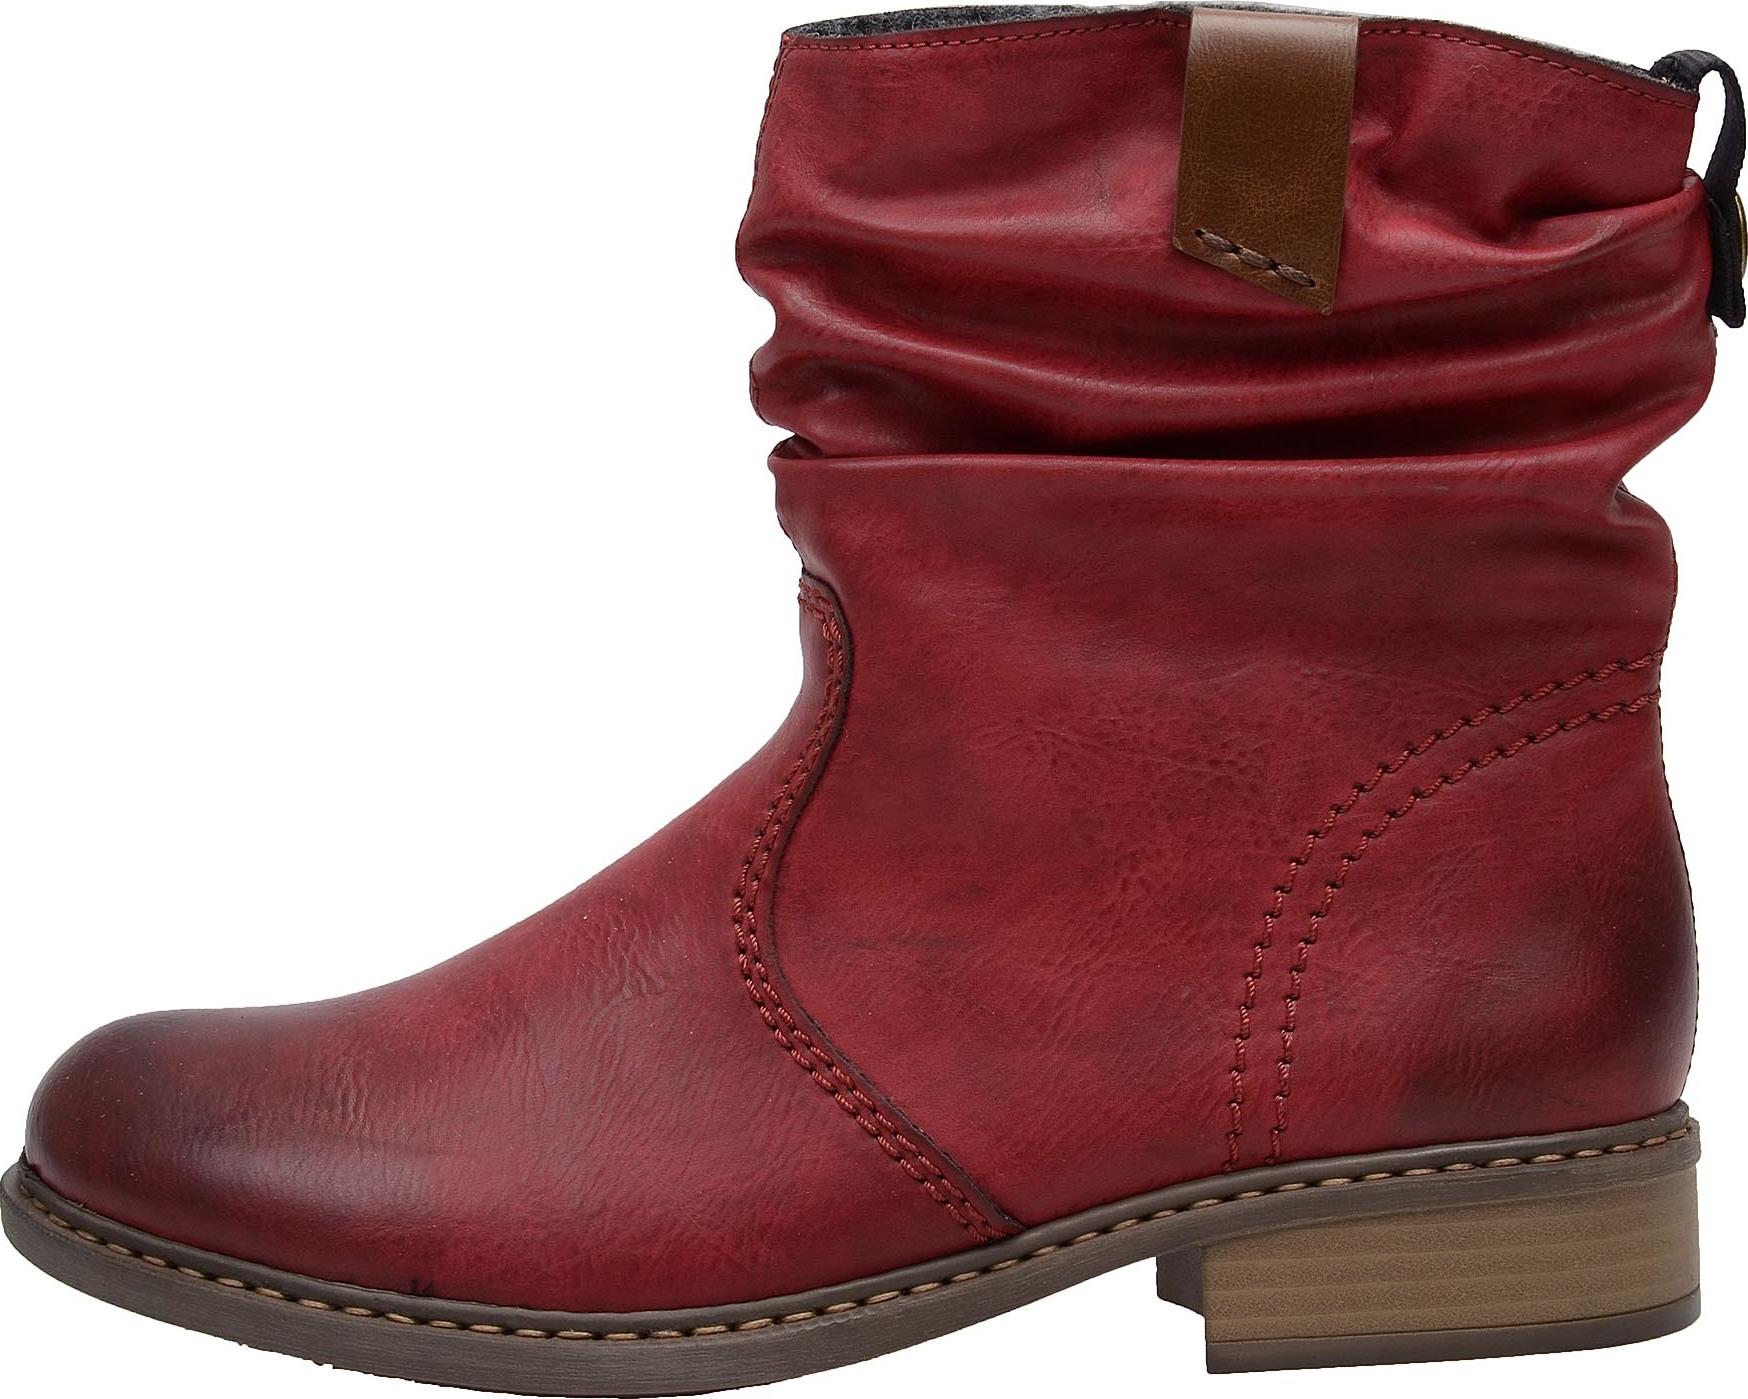 e633b03a8fa6 Dámská obuv RIEKER Z4180 35 ROT H W 7 – Rieker Antistress